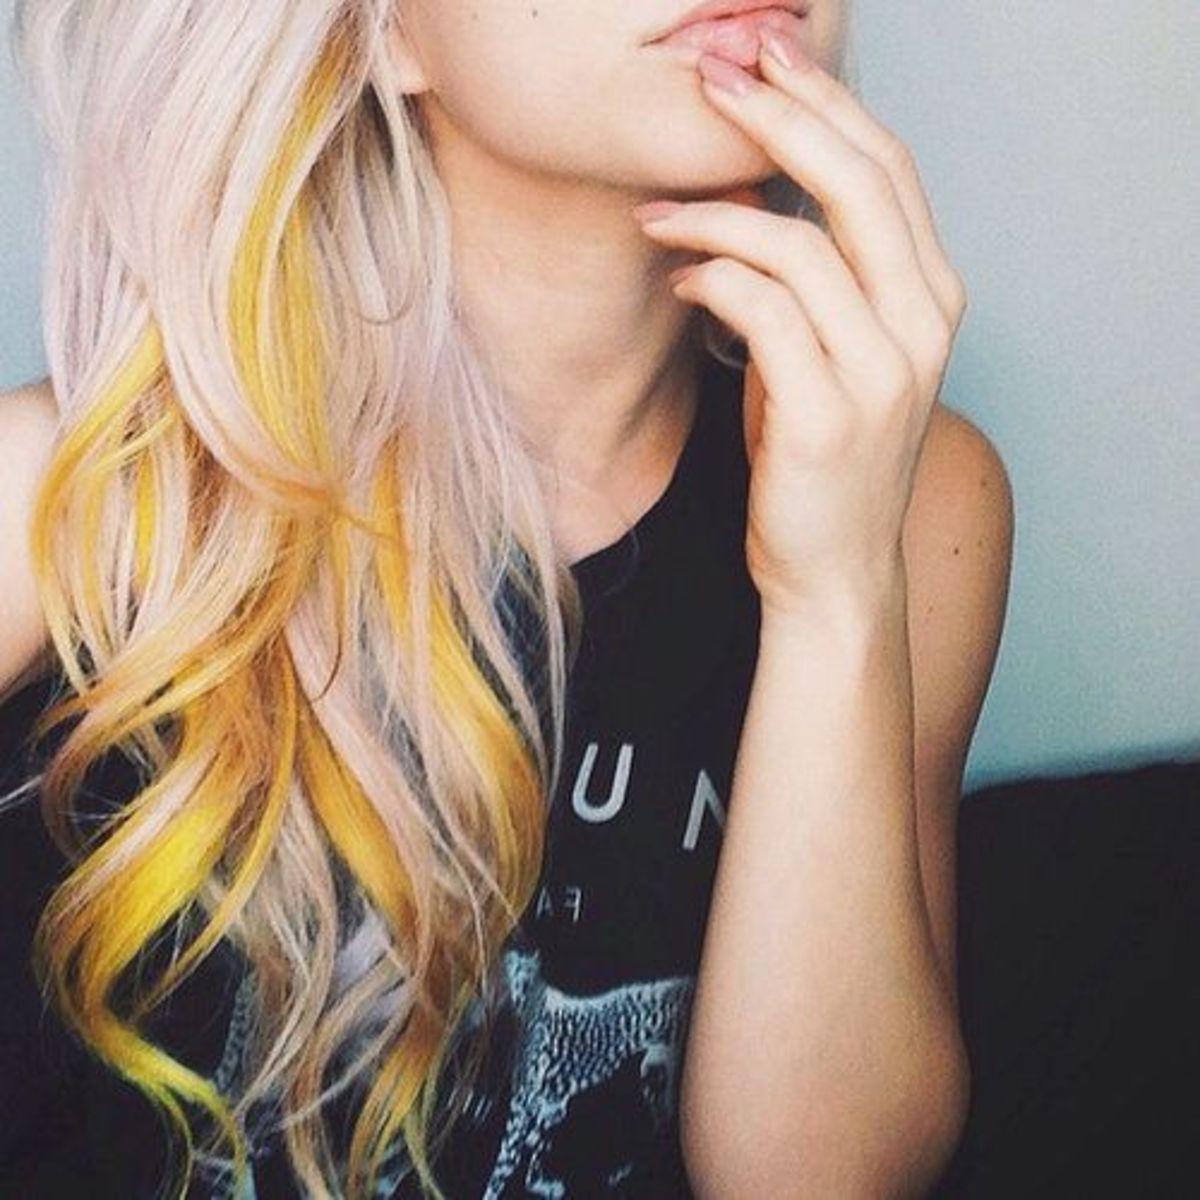 Diy hair 15 orange and yellow hair color ideas bellatory 1 sparks sunburst yellow solutioingenieria Choice Image